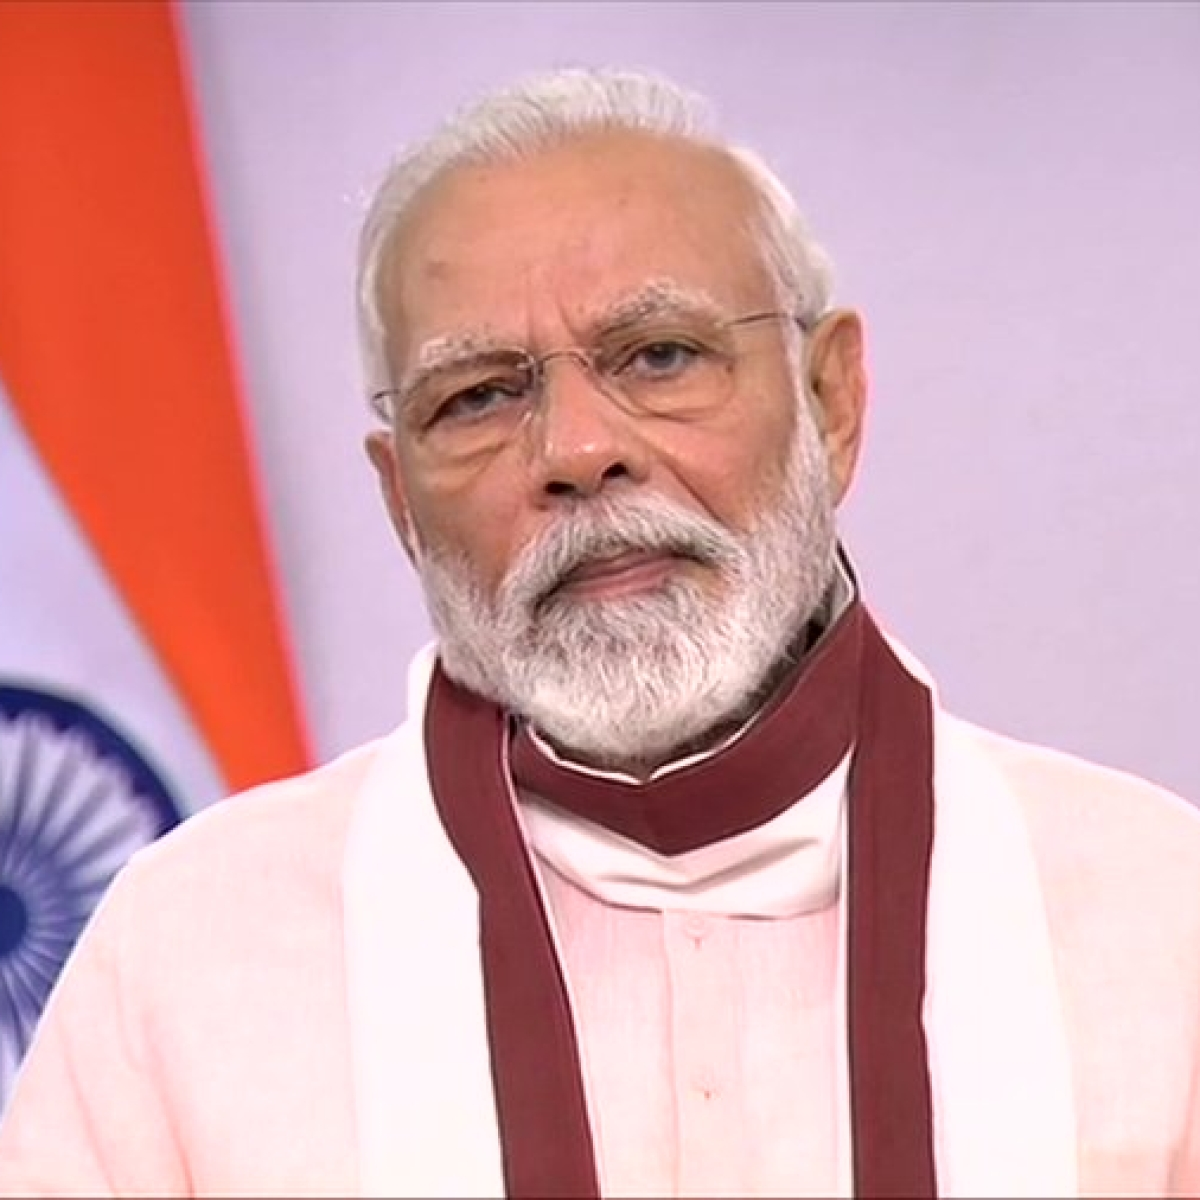 India's GDP growth contracts -23.9%: Twitter mocks PM, says #ModiHaiToMumkinHai